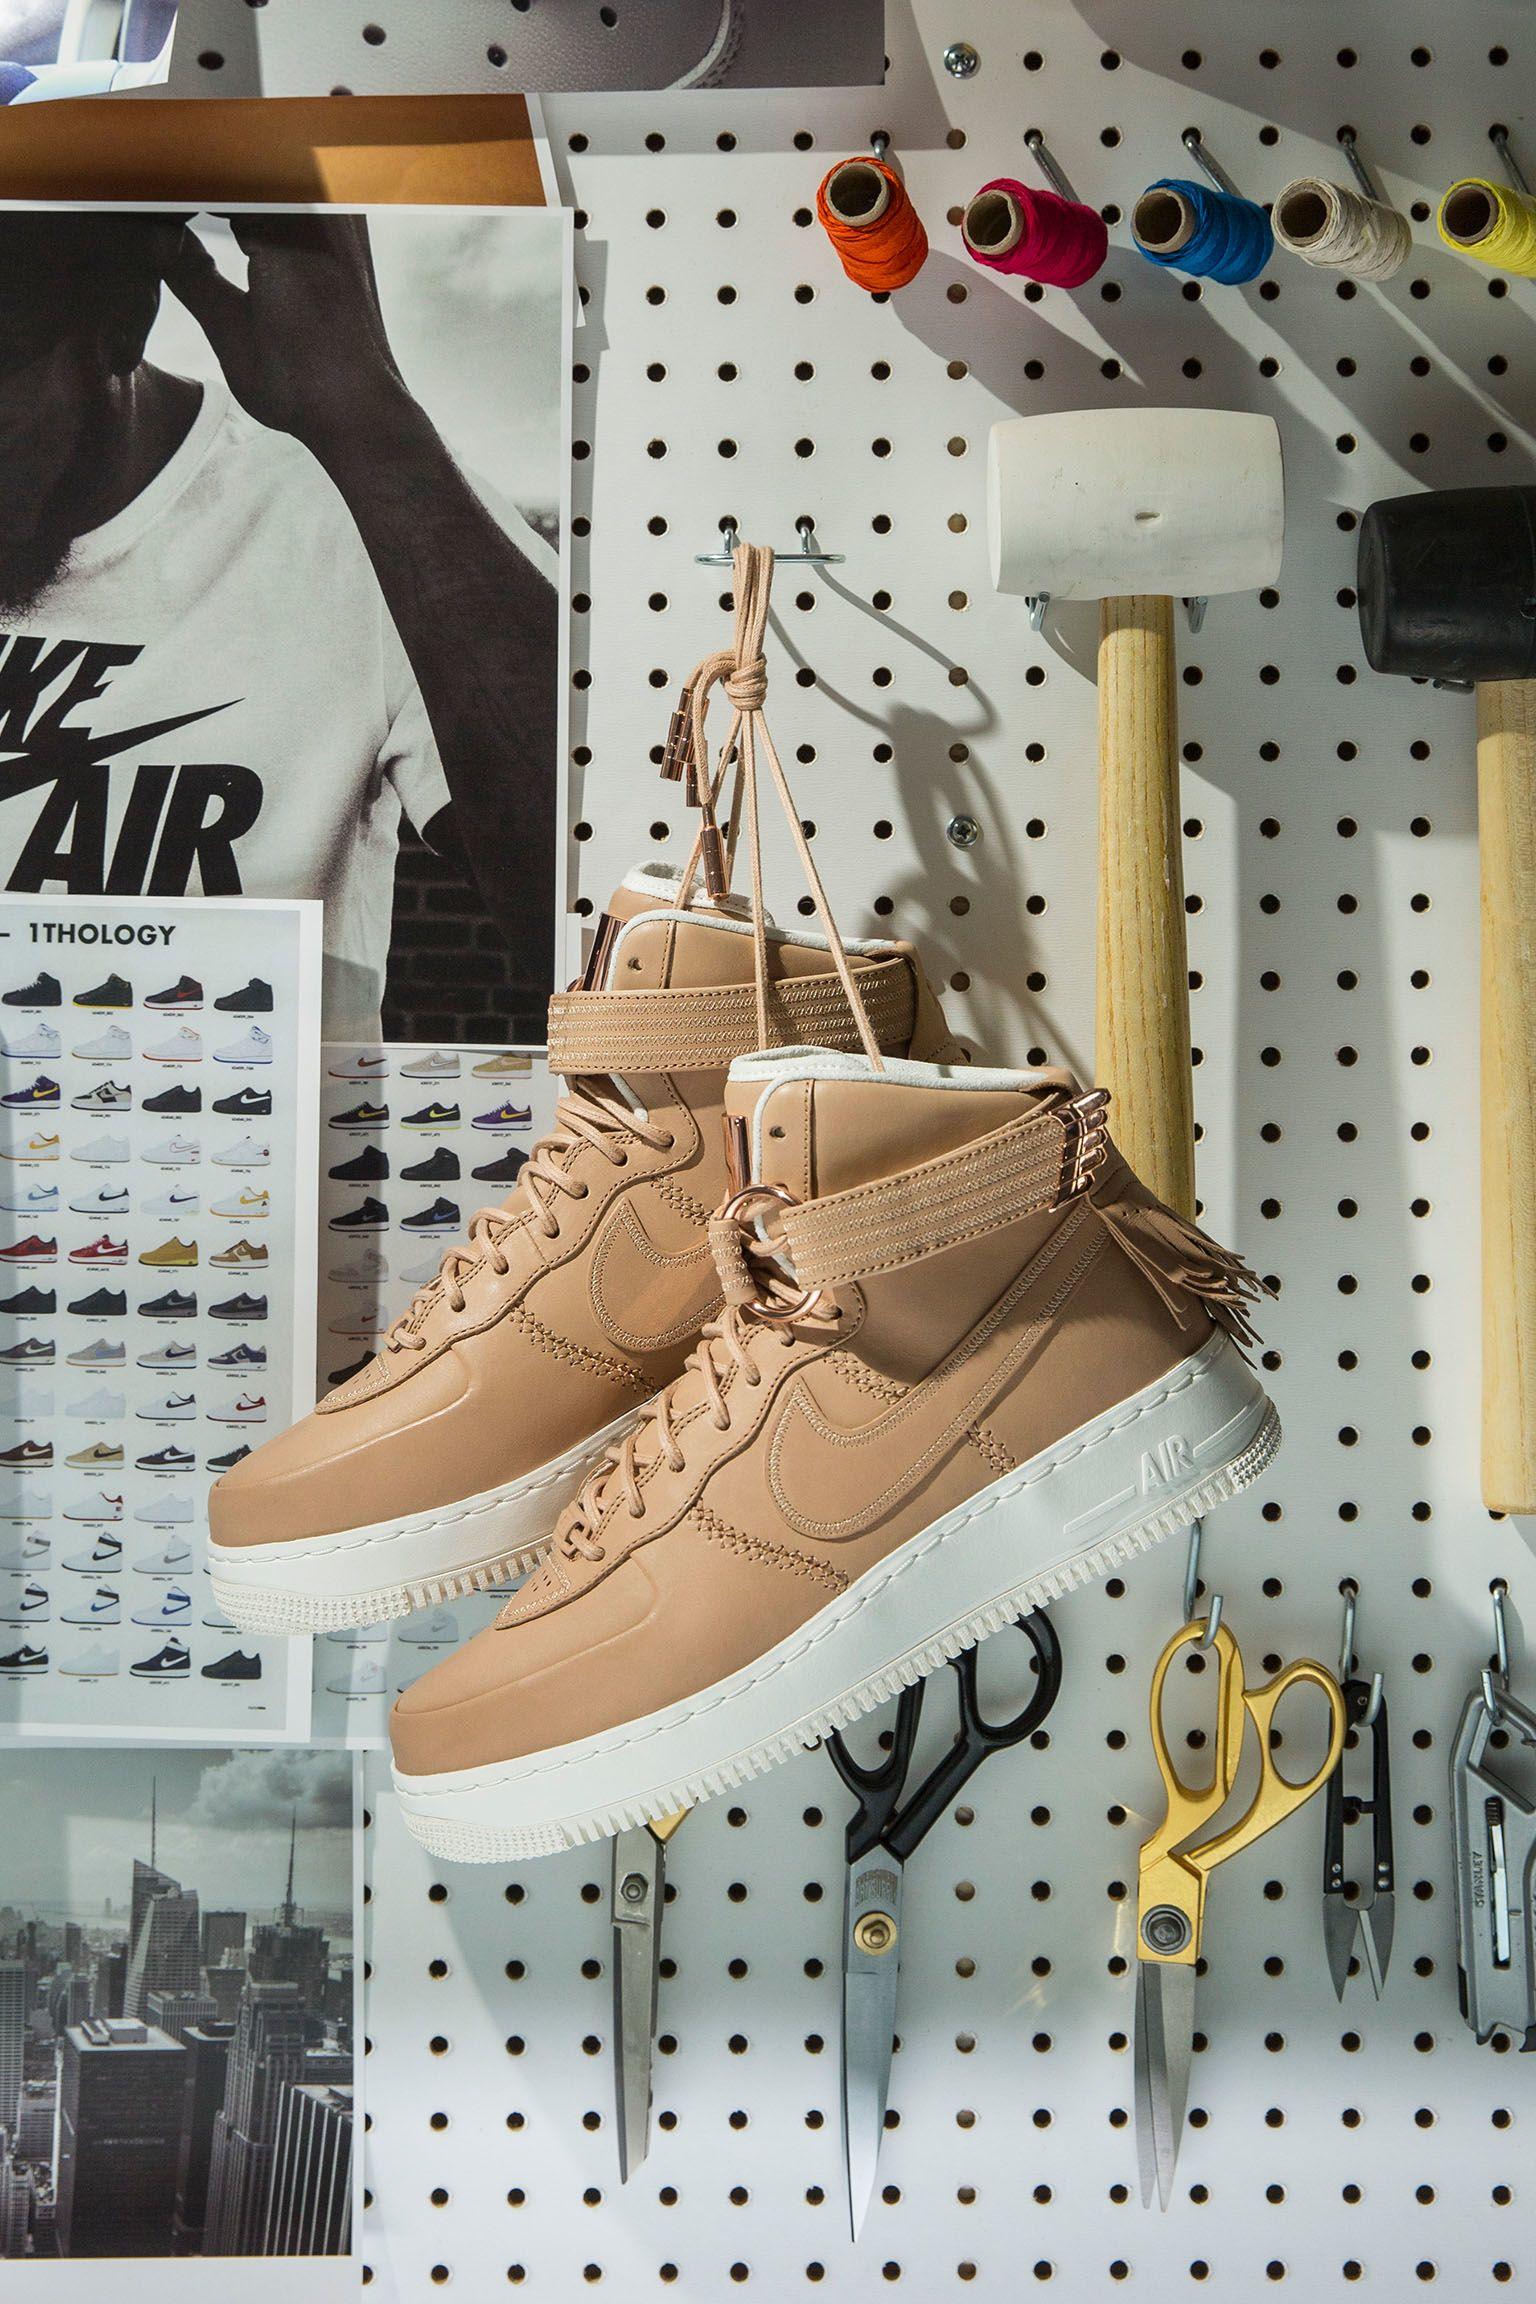 Dentro la scarpa: Nike Air Force 1 High Sport Luxury. Nike SNKRS IT